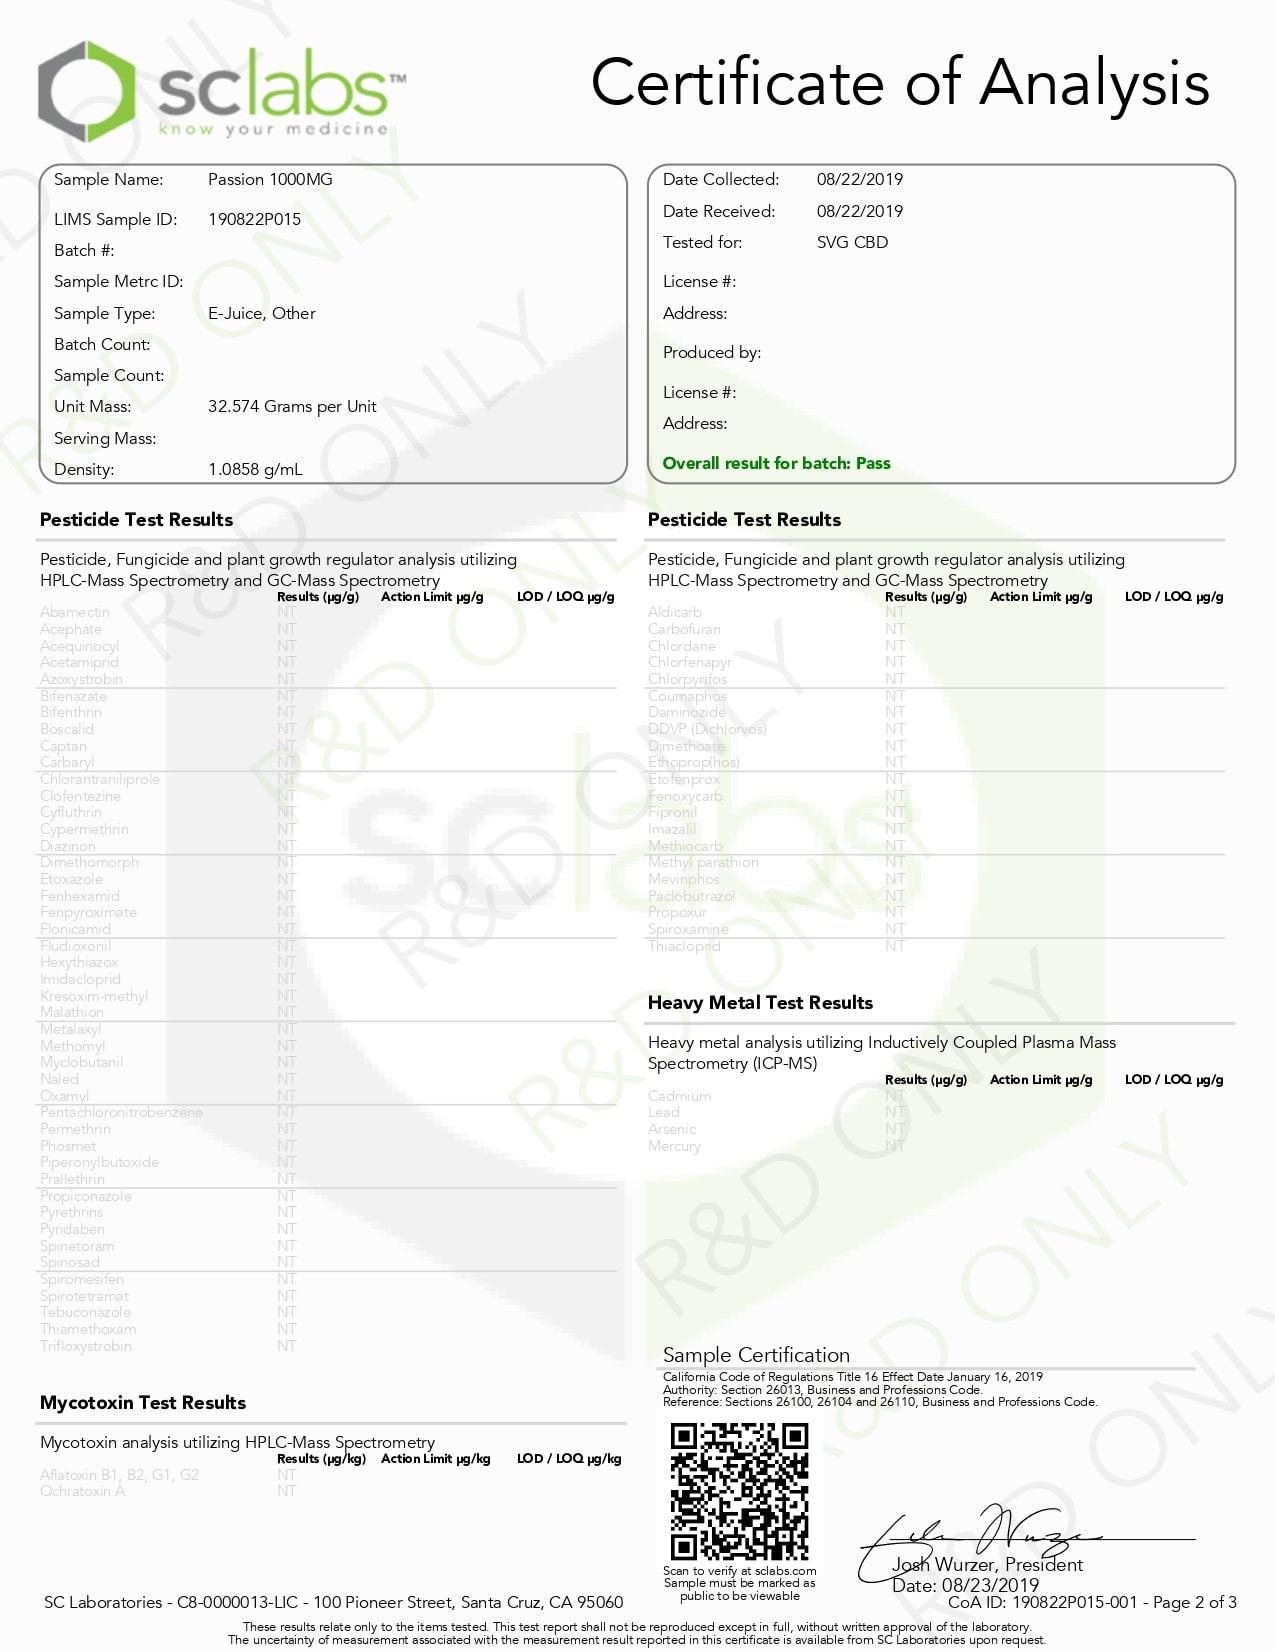 SAVAGE Passion CBD Vape Juice 1000mg Lab Report